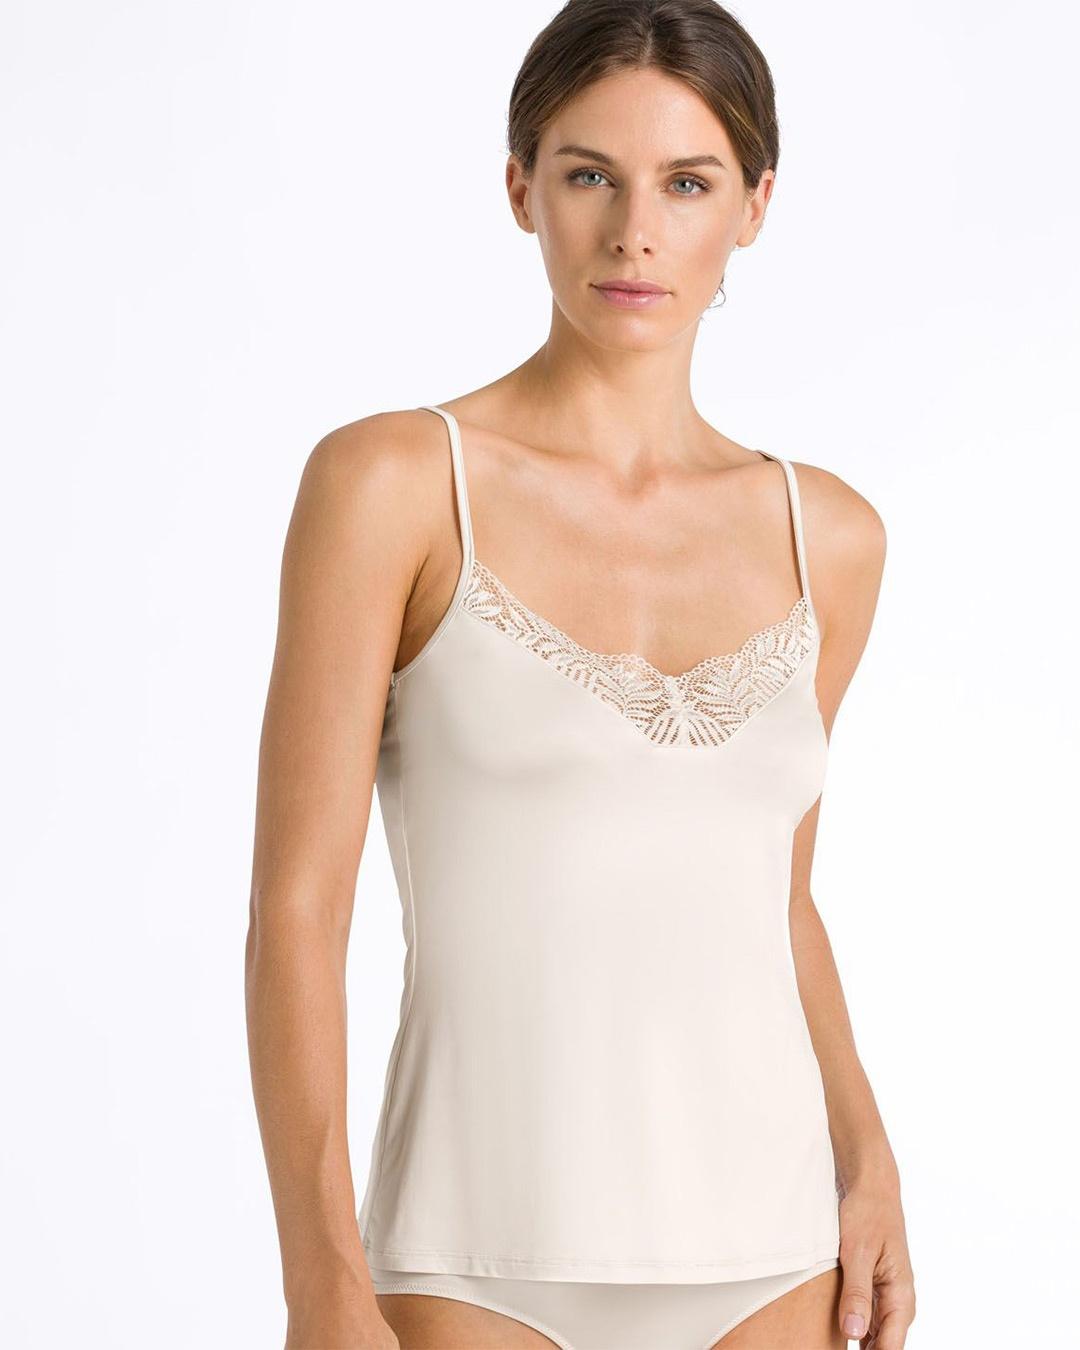 hanro-irini-spaghetti-top-fullm-2933-front-dianes-lingerie-vancouver-1080x1350